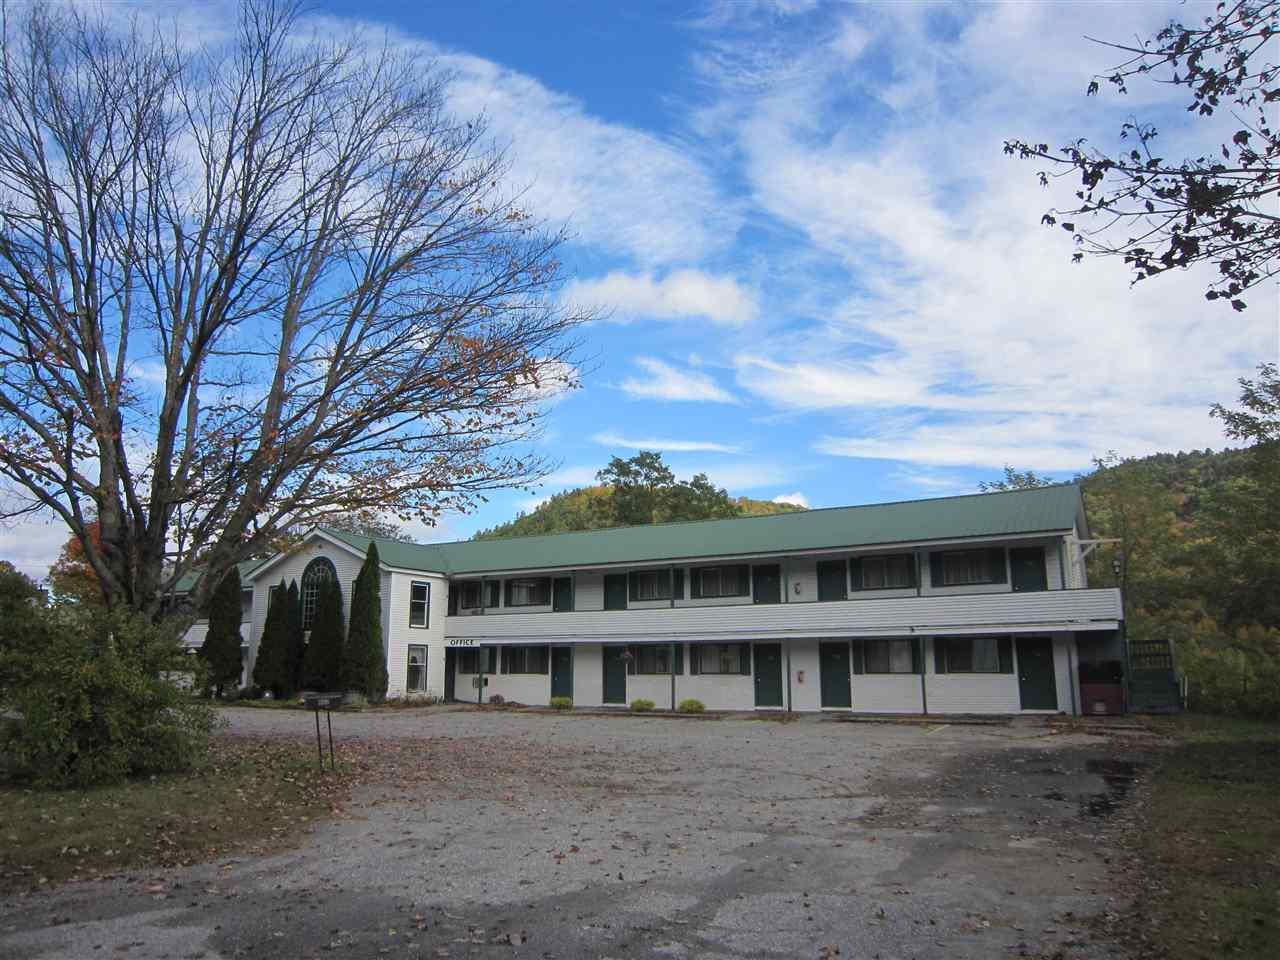 Mount-Snow-Real-Estate-4624810-1